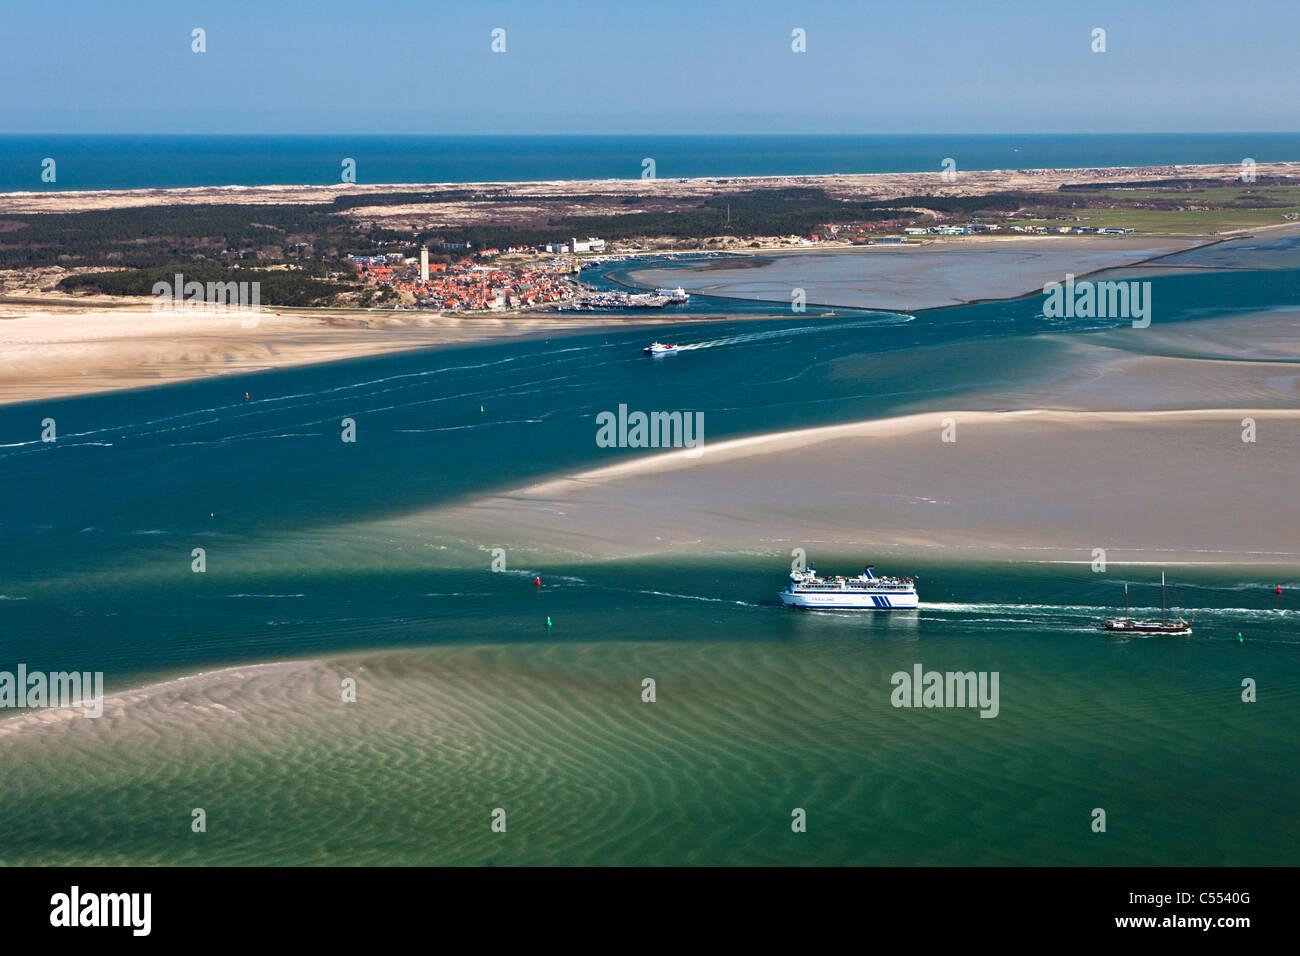 Holland, Island Terschelling, Wadden Sea. Unesco World Heritage Site. Low tide. Ferry Boat, village Terschelling - Stock Image